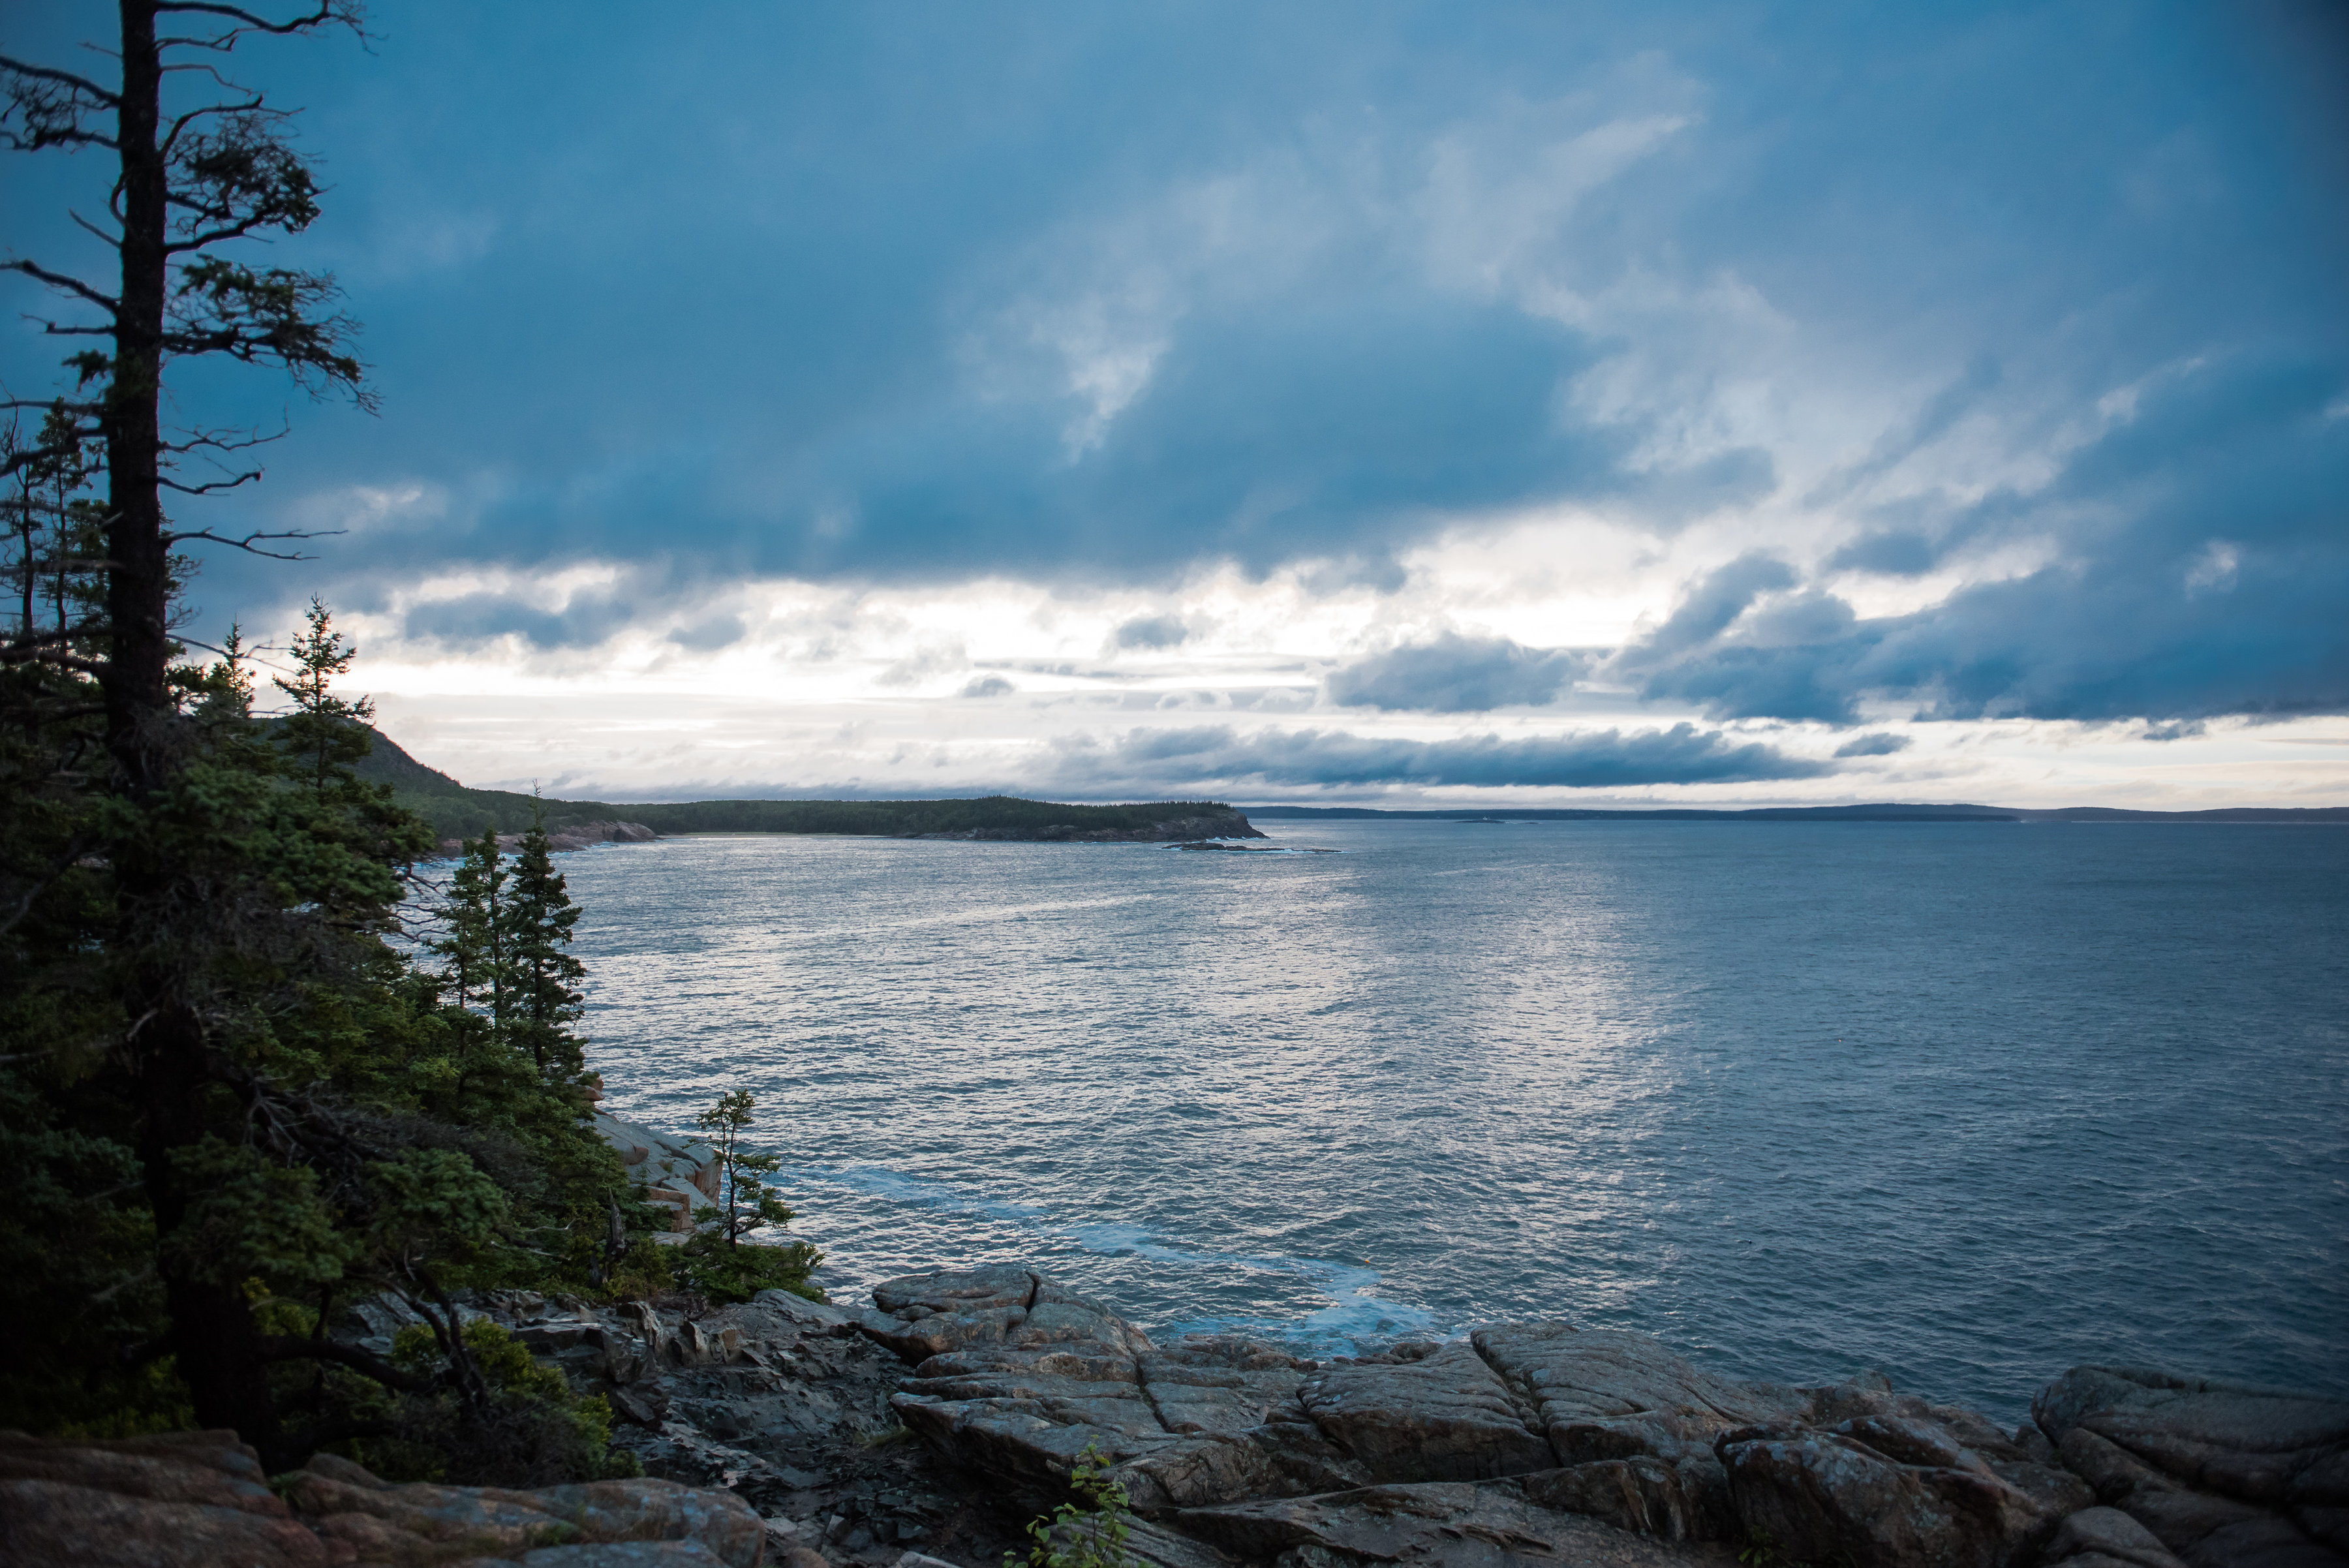 Wedding Proposal Ideas in Bar Harbor, Maine